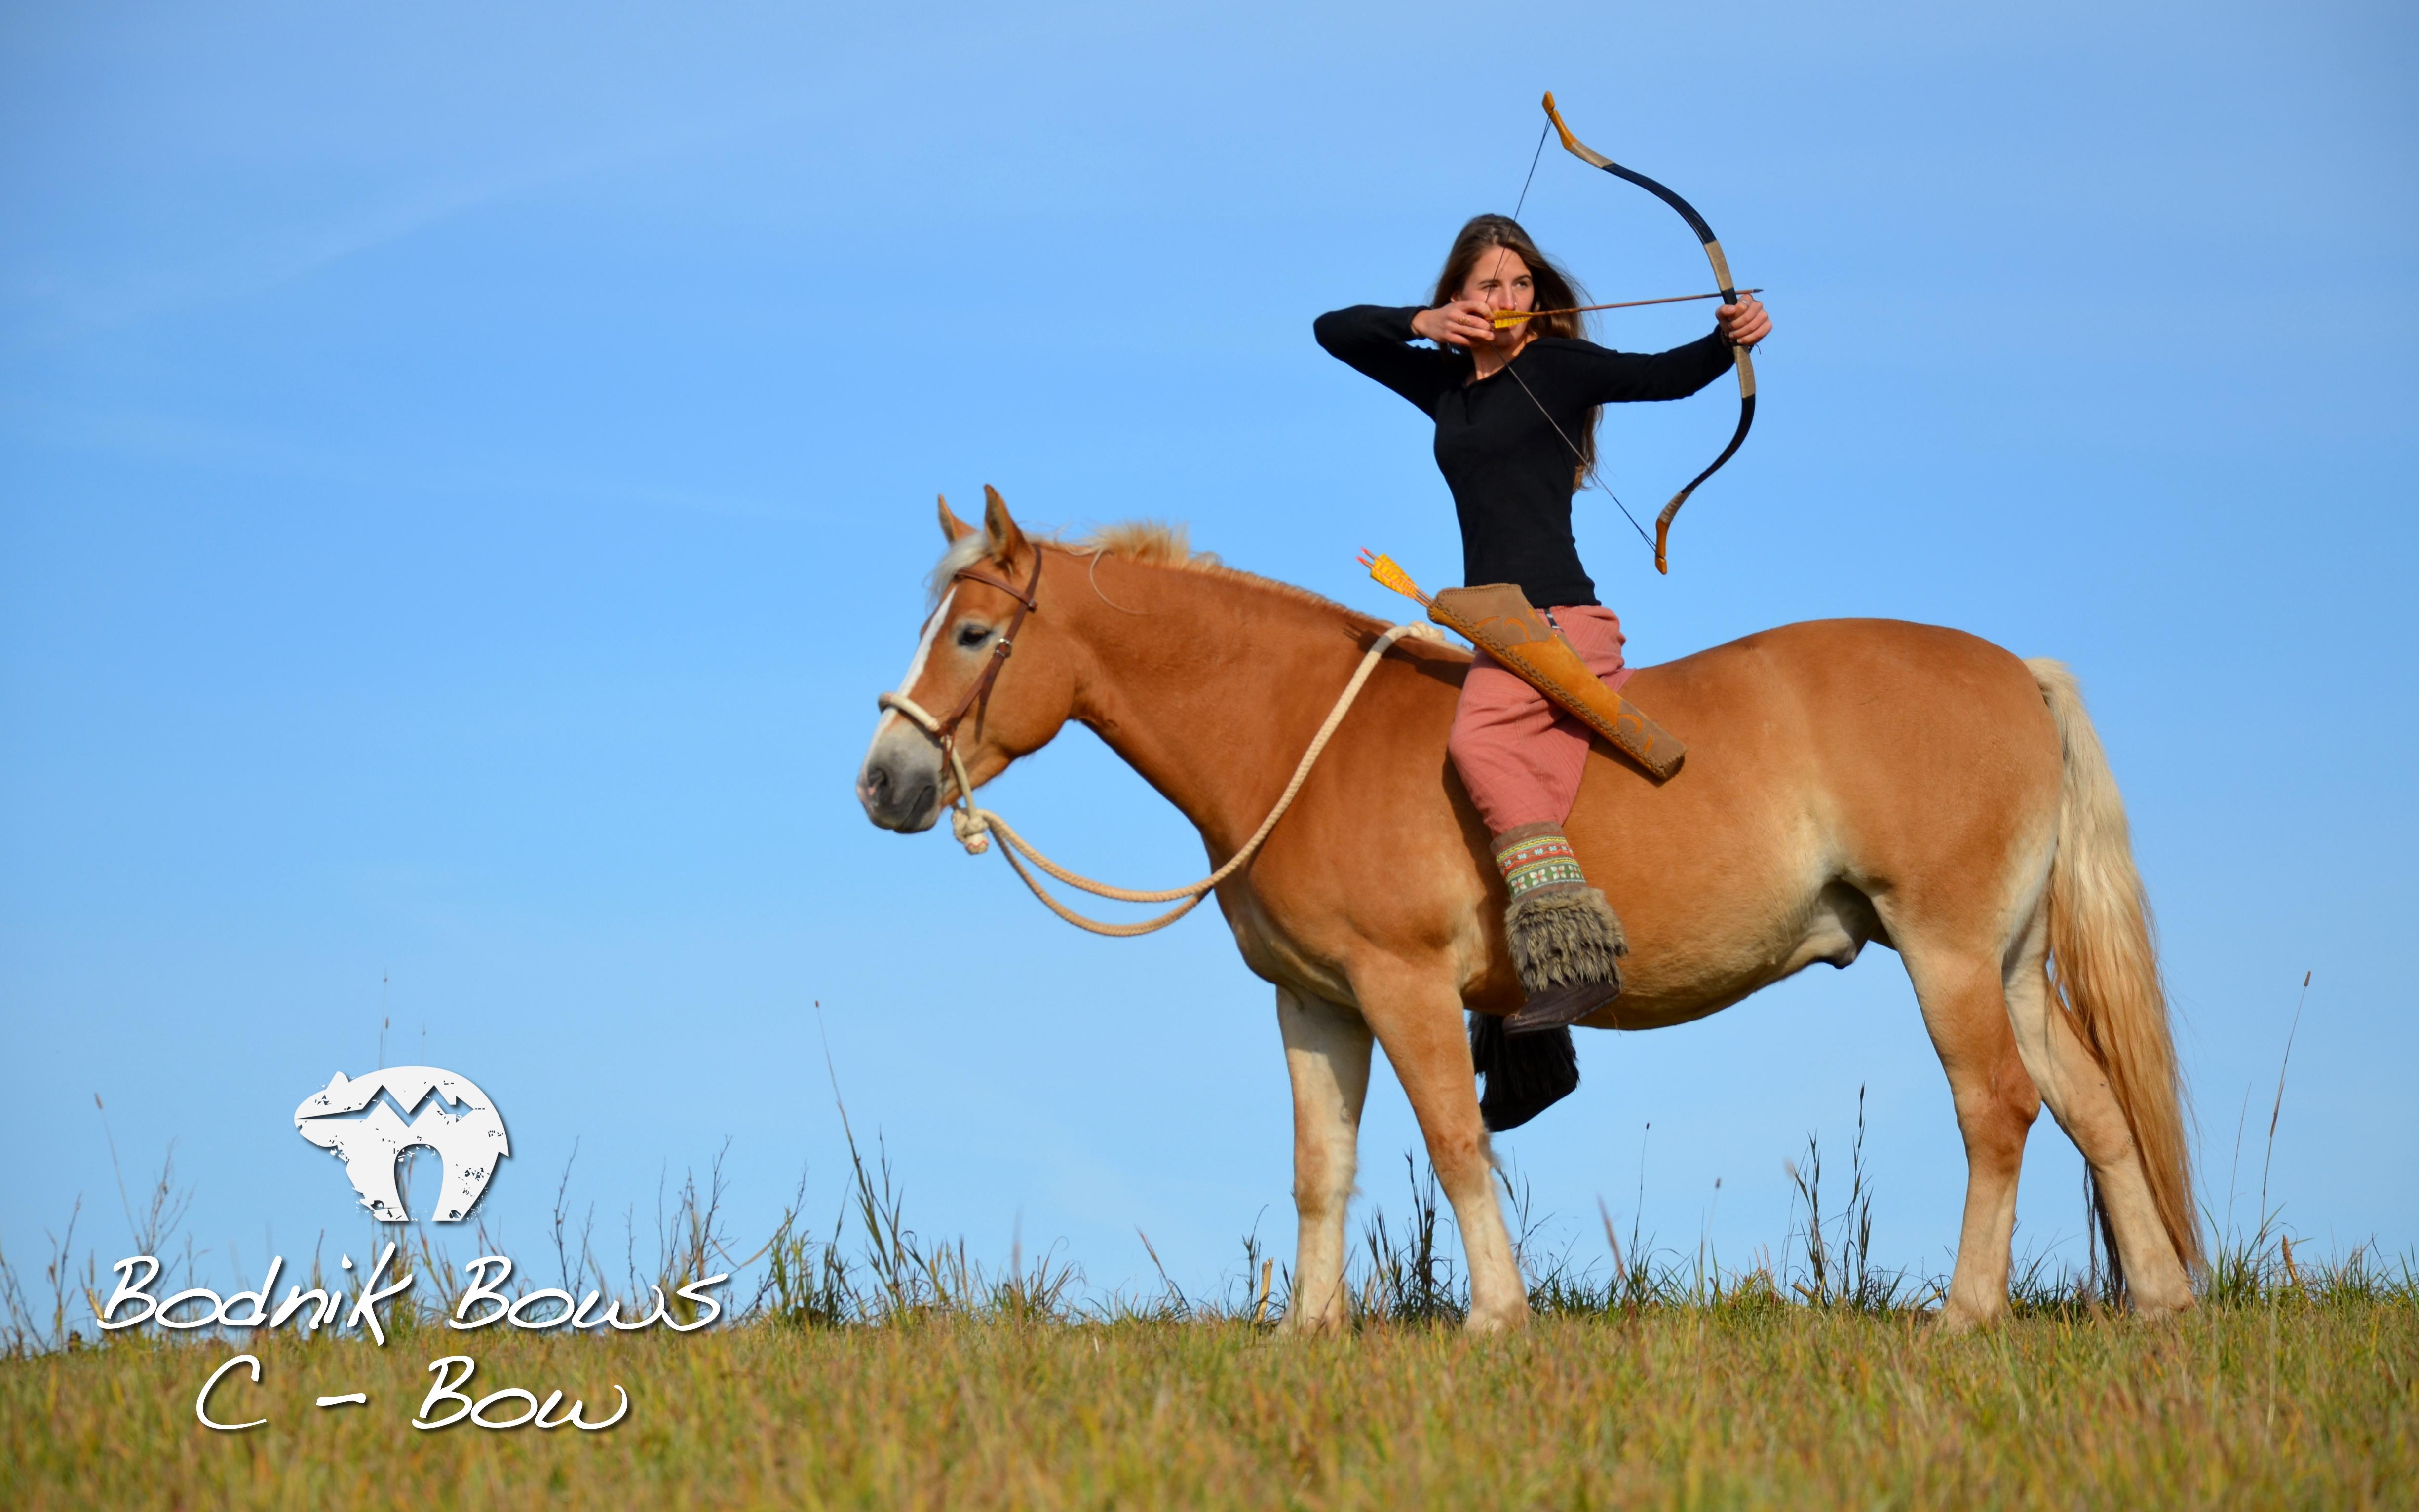 download Hintergrundbild C Bow Horseback Archery 4901x3064